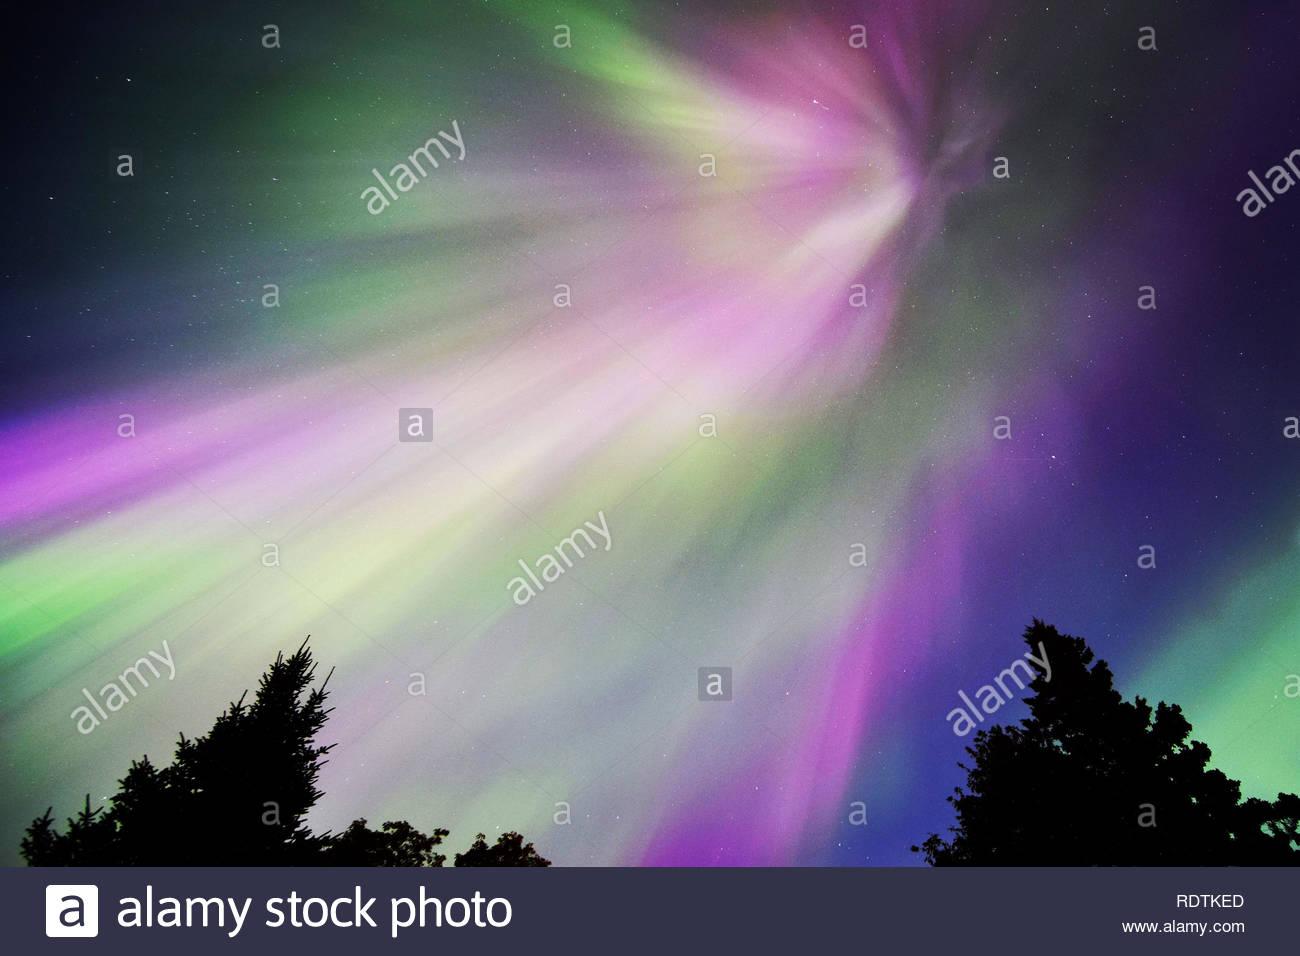 Northern Lights Starburst - Stock Image